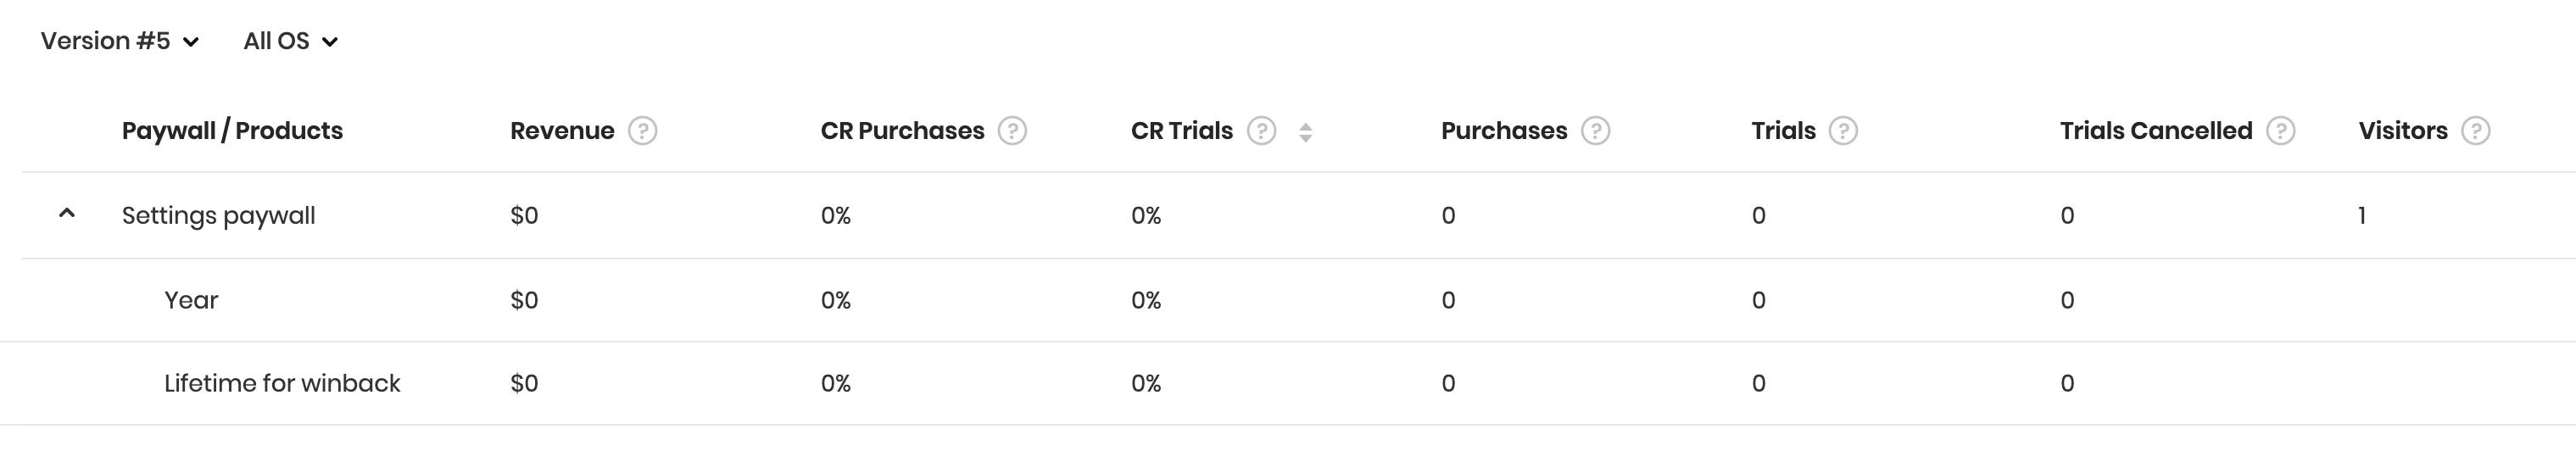 Paywall metrics